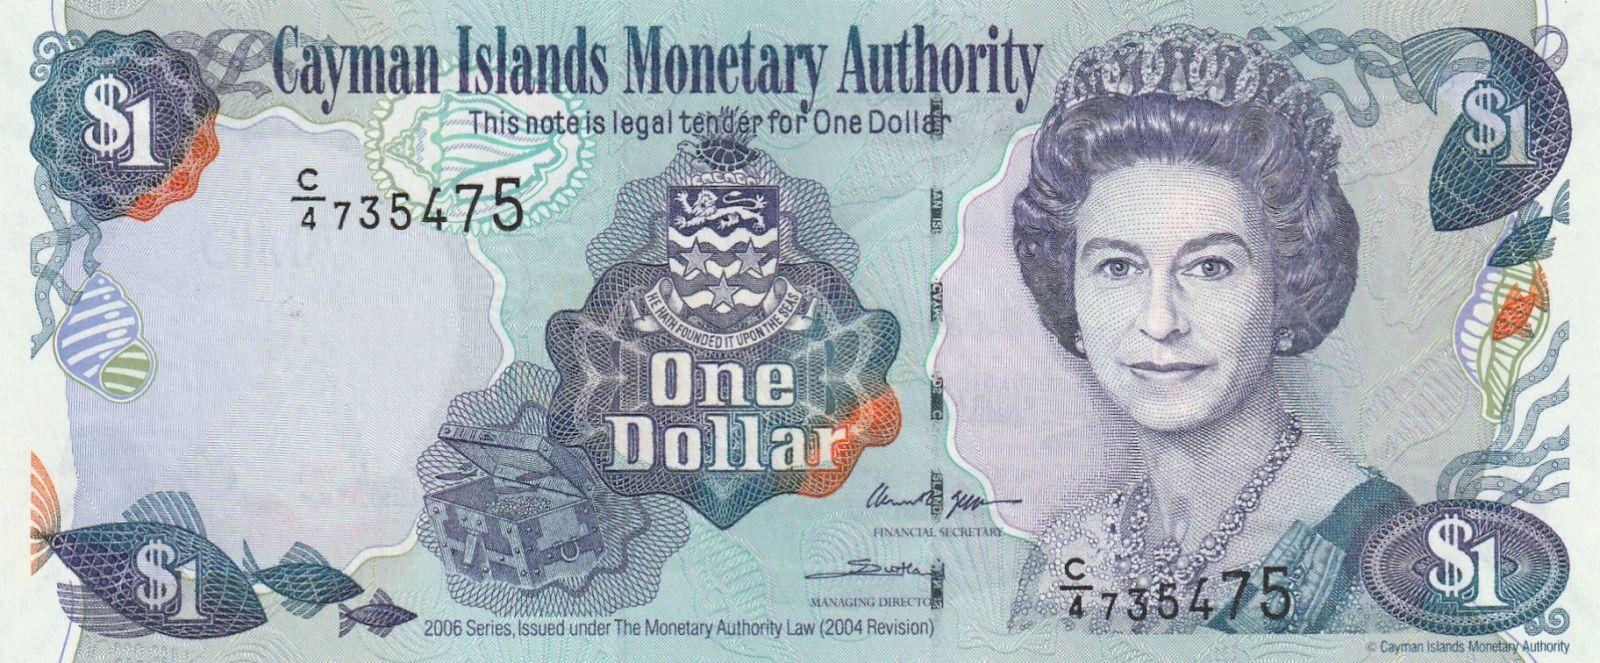 1 Dollar, Kaimanské ostrovy, 2006